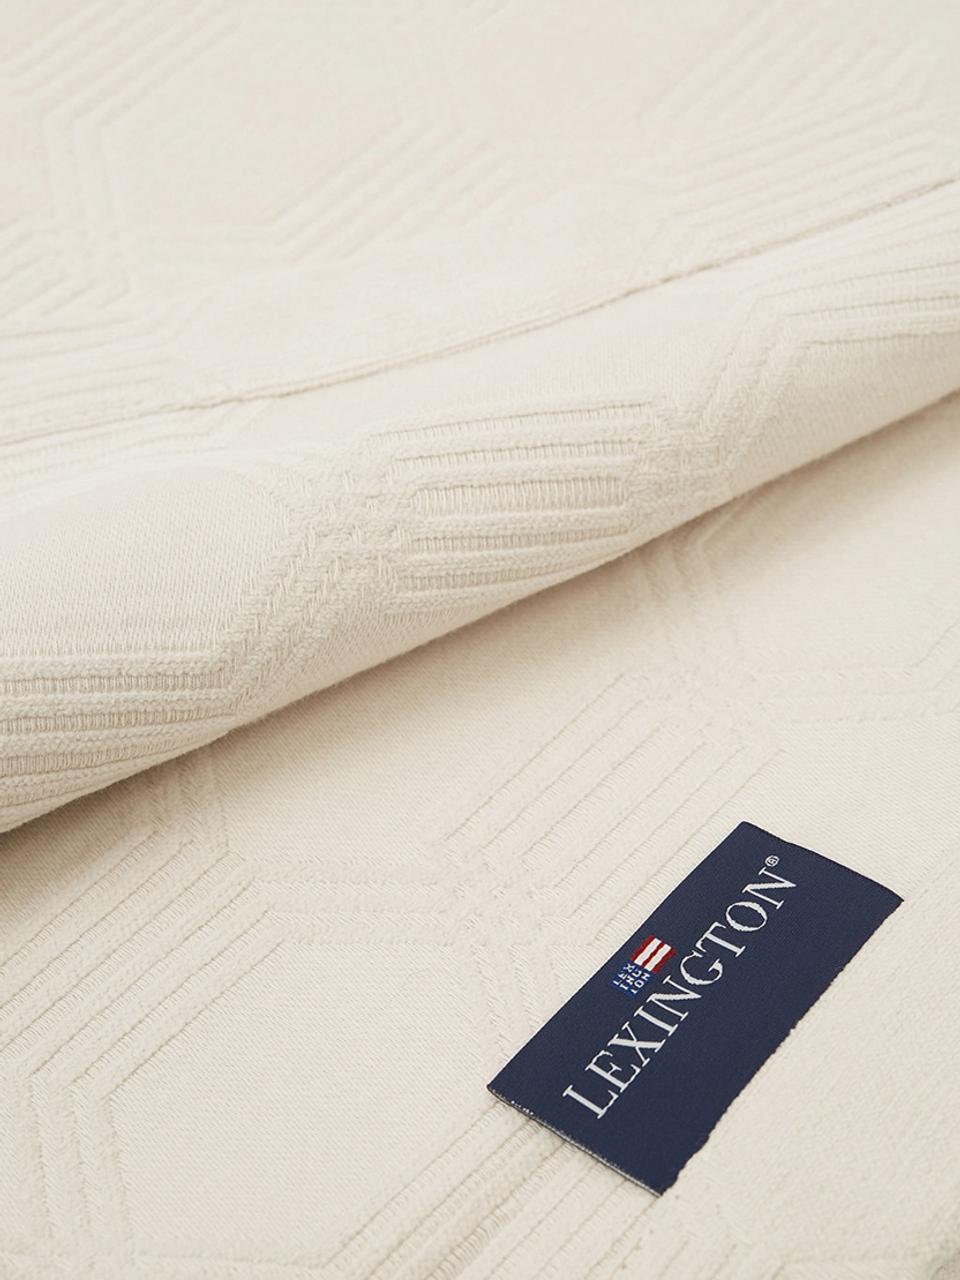 Samt-Tagesdecke Jacky in Offwhite, Webart: Jacquard, Gebrochenes Weiß, 160 x 240 cm